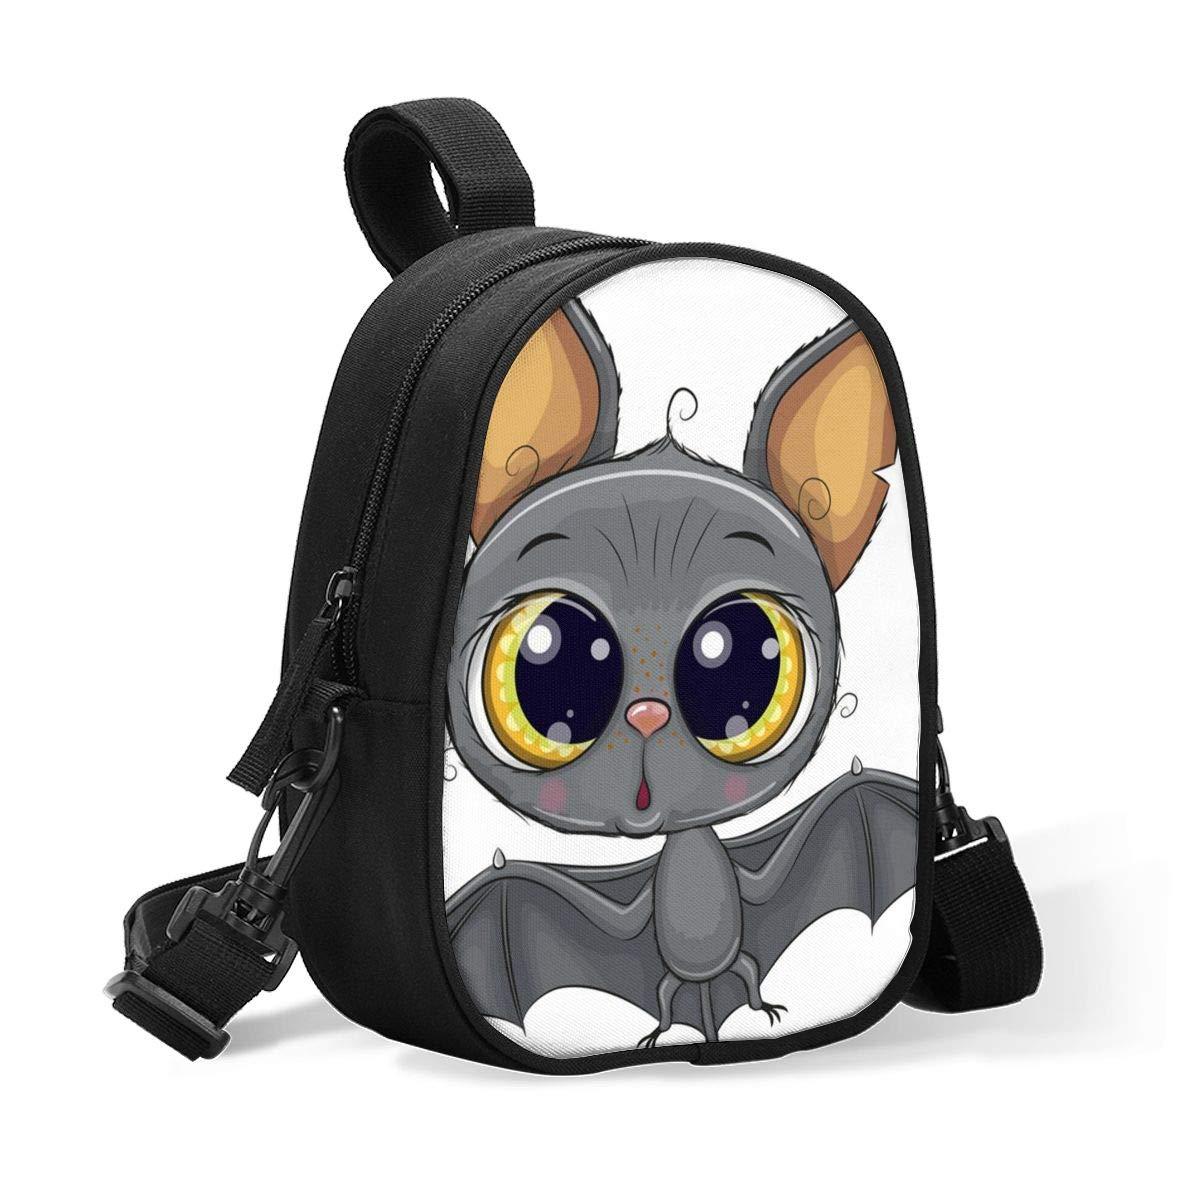 Insulated Baby Bottle Storage Cooler Bag Cute Cartoon Bat Funny Halloween Breastmilk Cooler, Day Care & Lunch Bag for Baby Formula, Breast Milk, Sports Drink - Water Bottle Holder(2 Bottles)